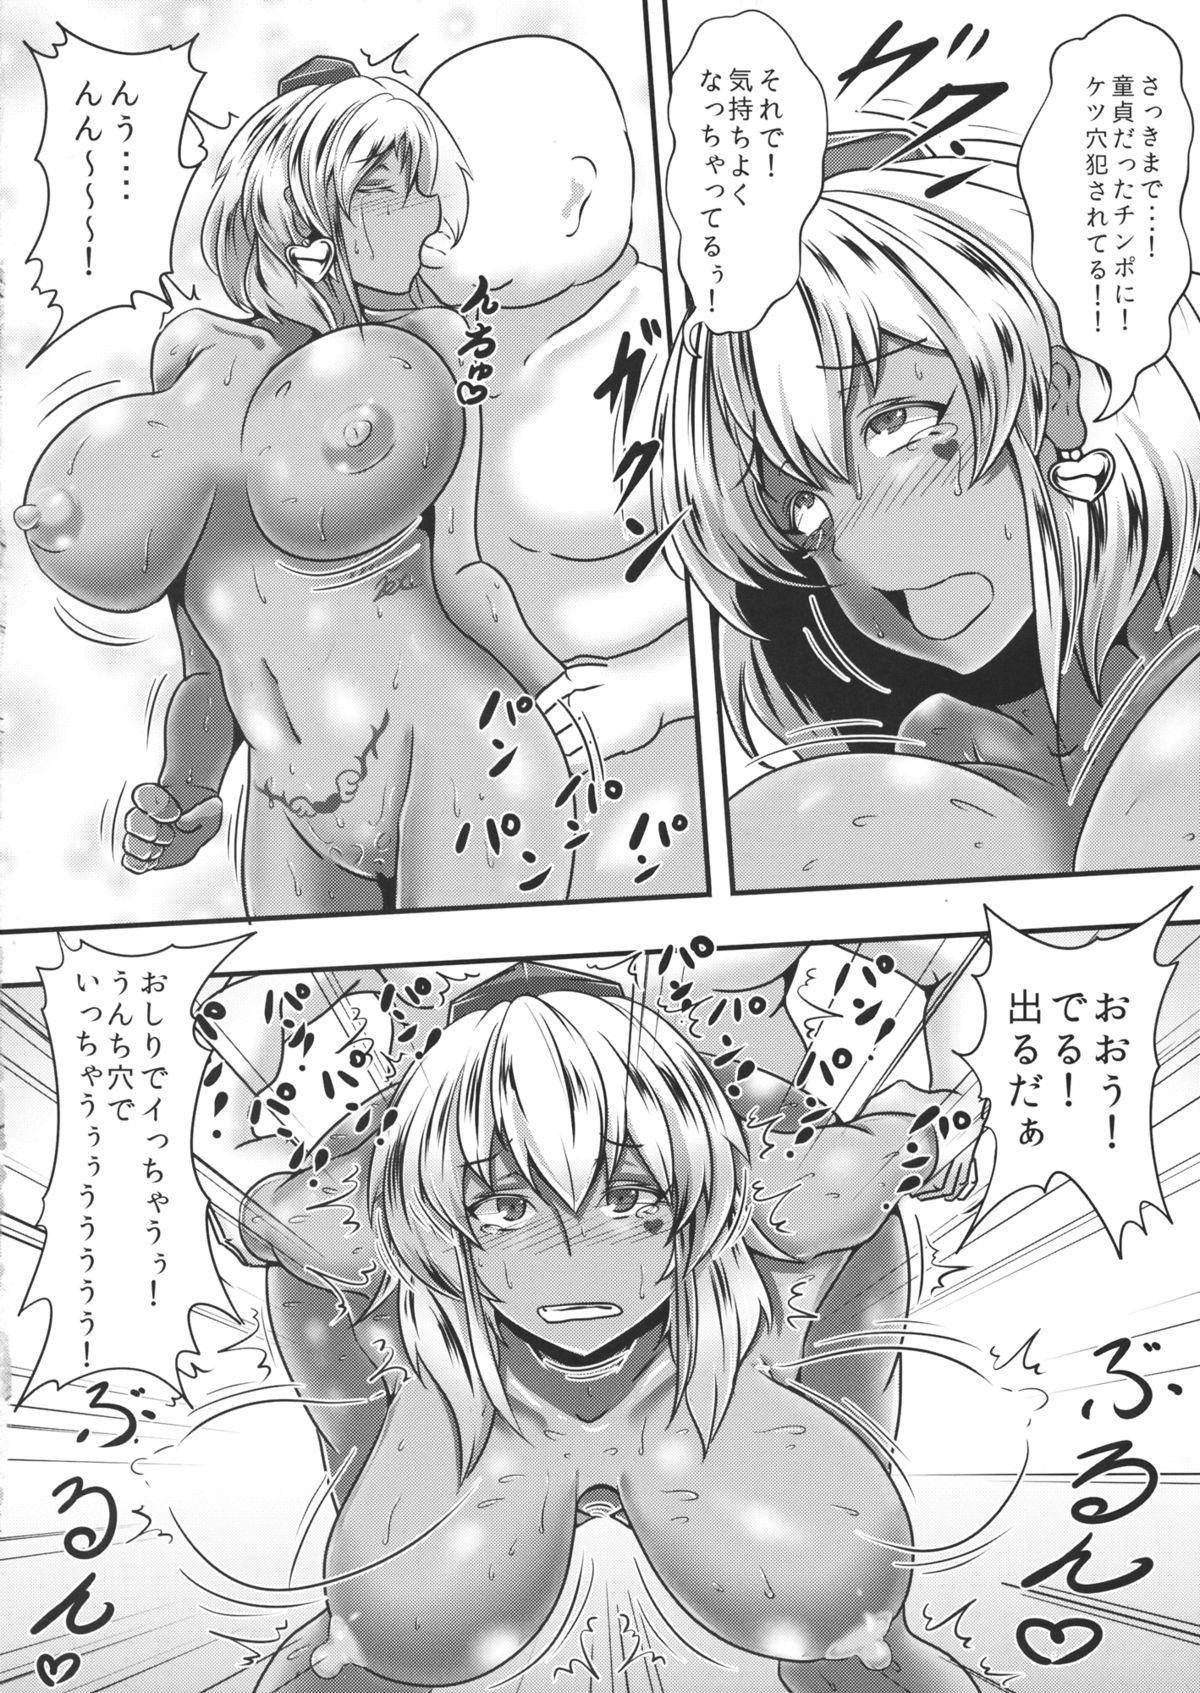 Kuro GALASS 14